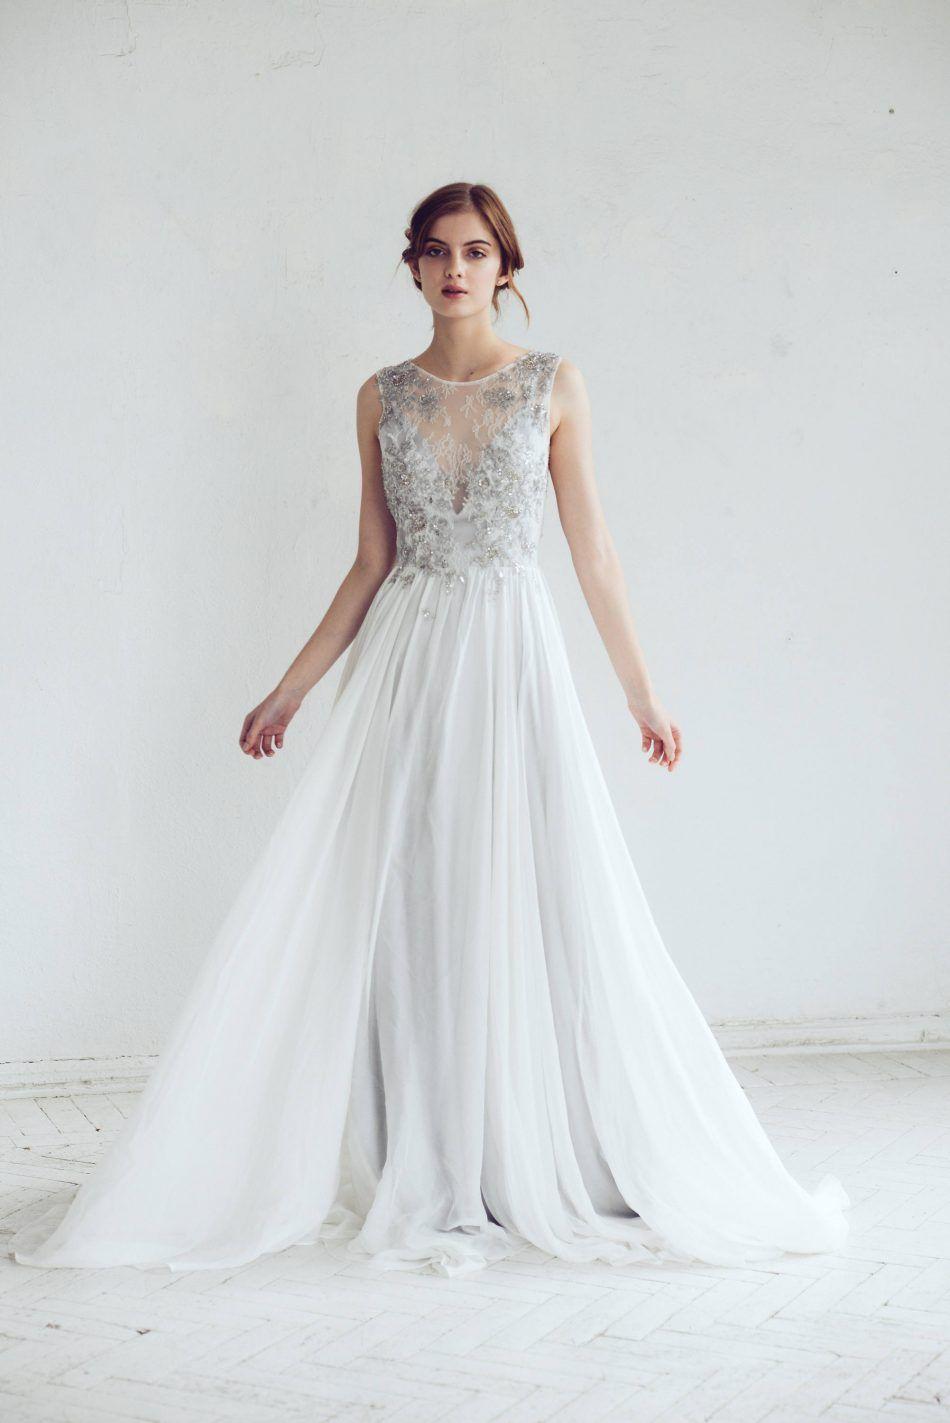 Silver Gray Wedding Dress | Brides, Grooms, Weddings & Honeymoons ...